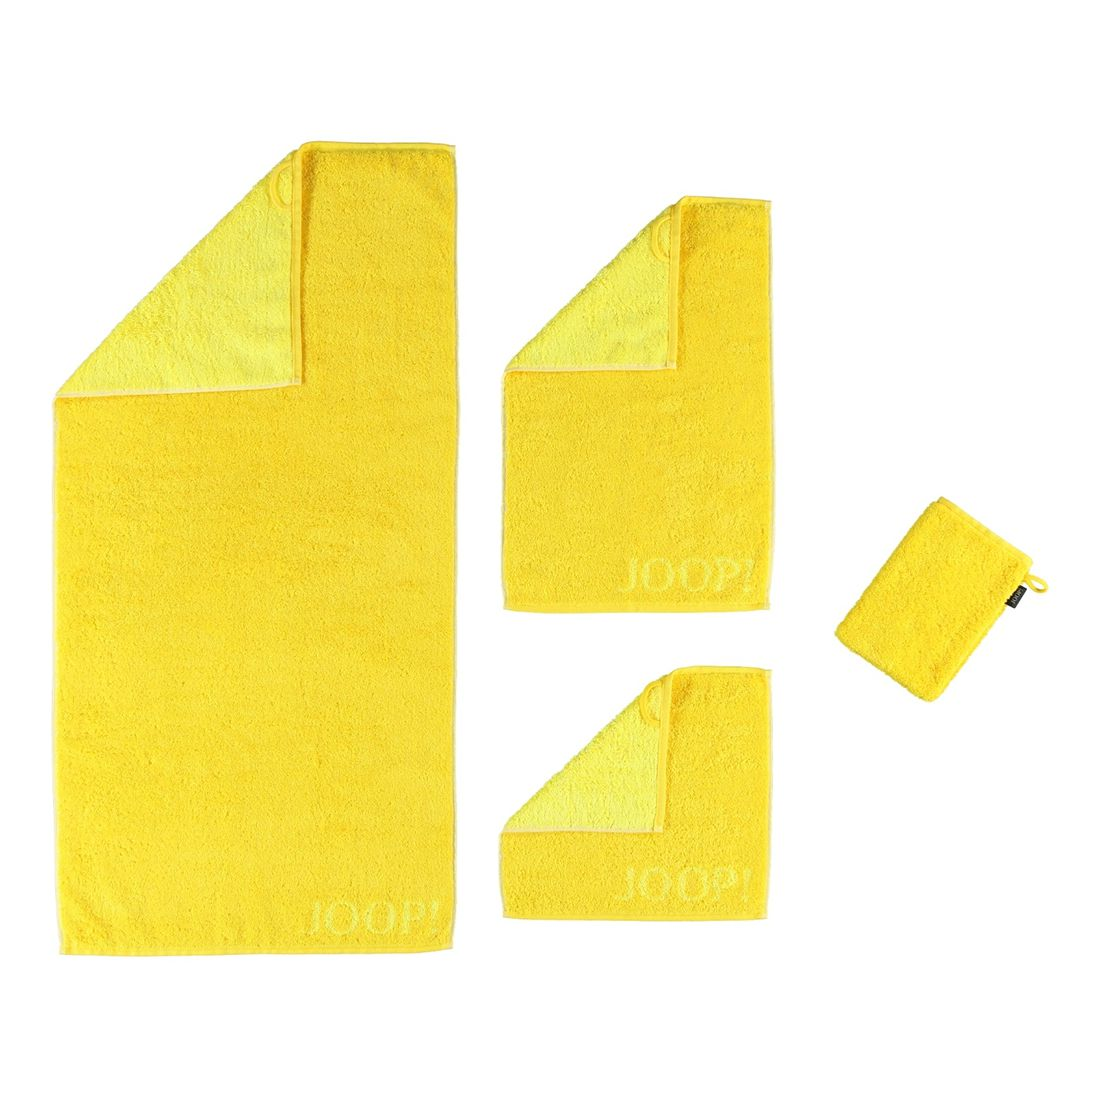 Handtuch Classic Doubleface – 100% Baumwolle sonnenGelb – 55 – Waschhandschuh: 16 x 22 cm, Joop günstig